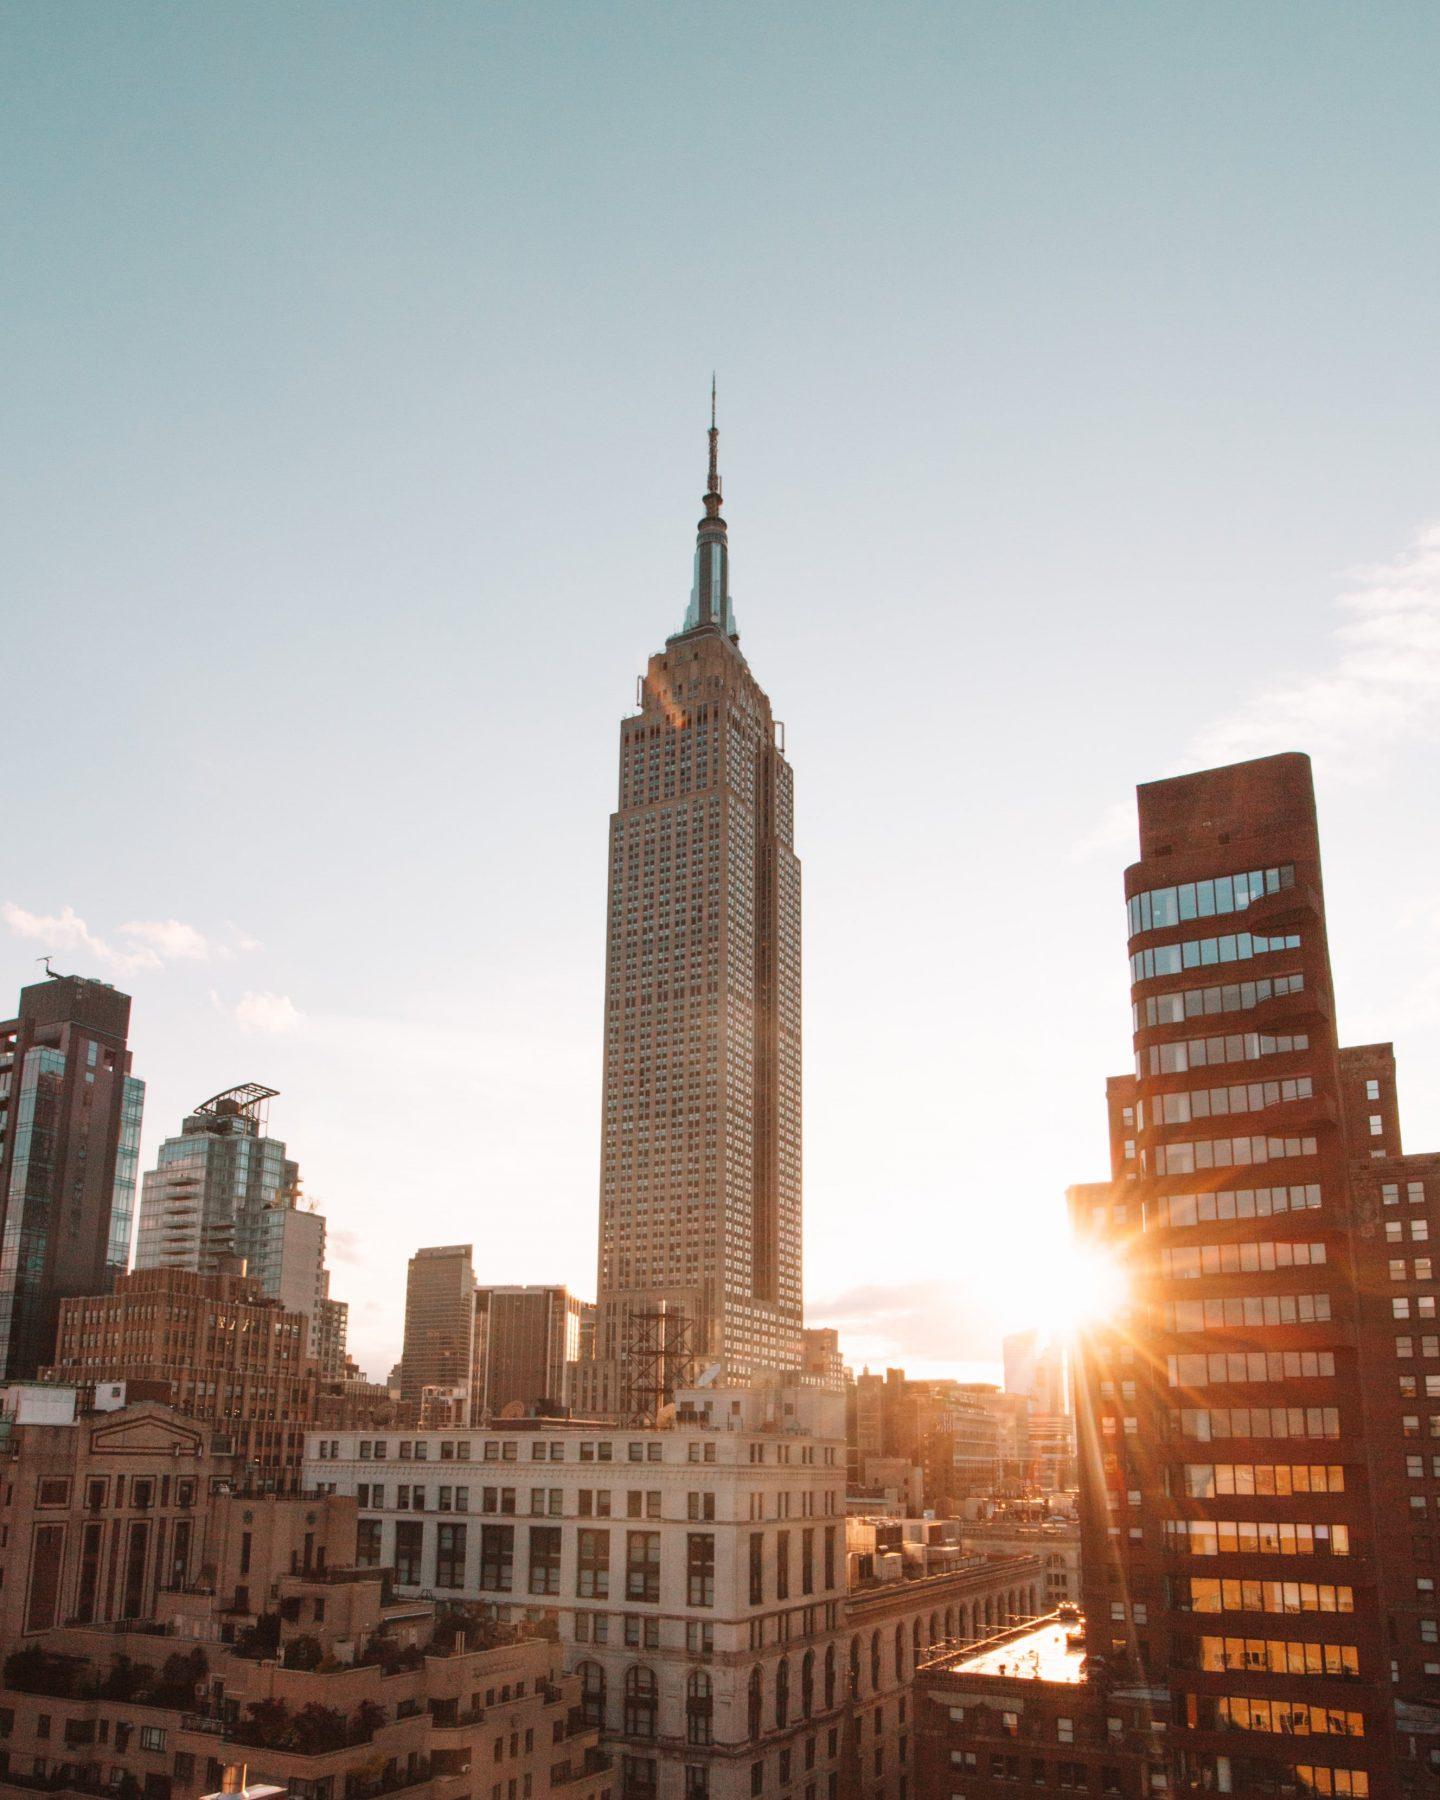 The best views in New York: where to find the best Manhattan skyline